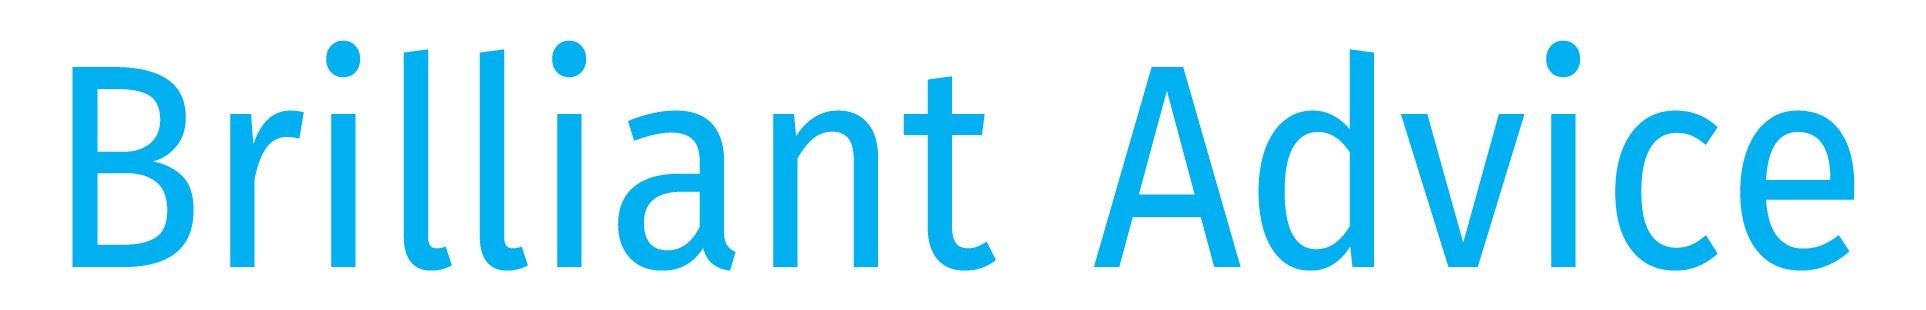 brilliant-advice-logo